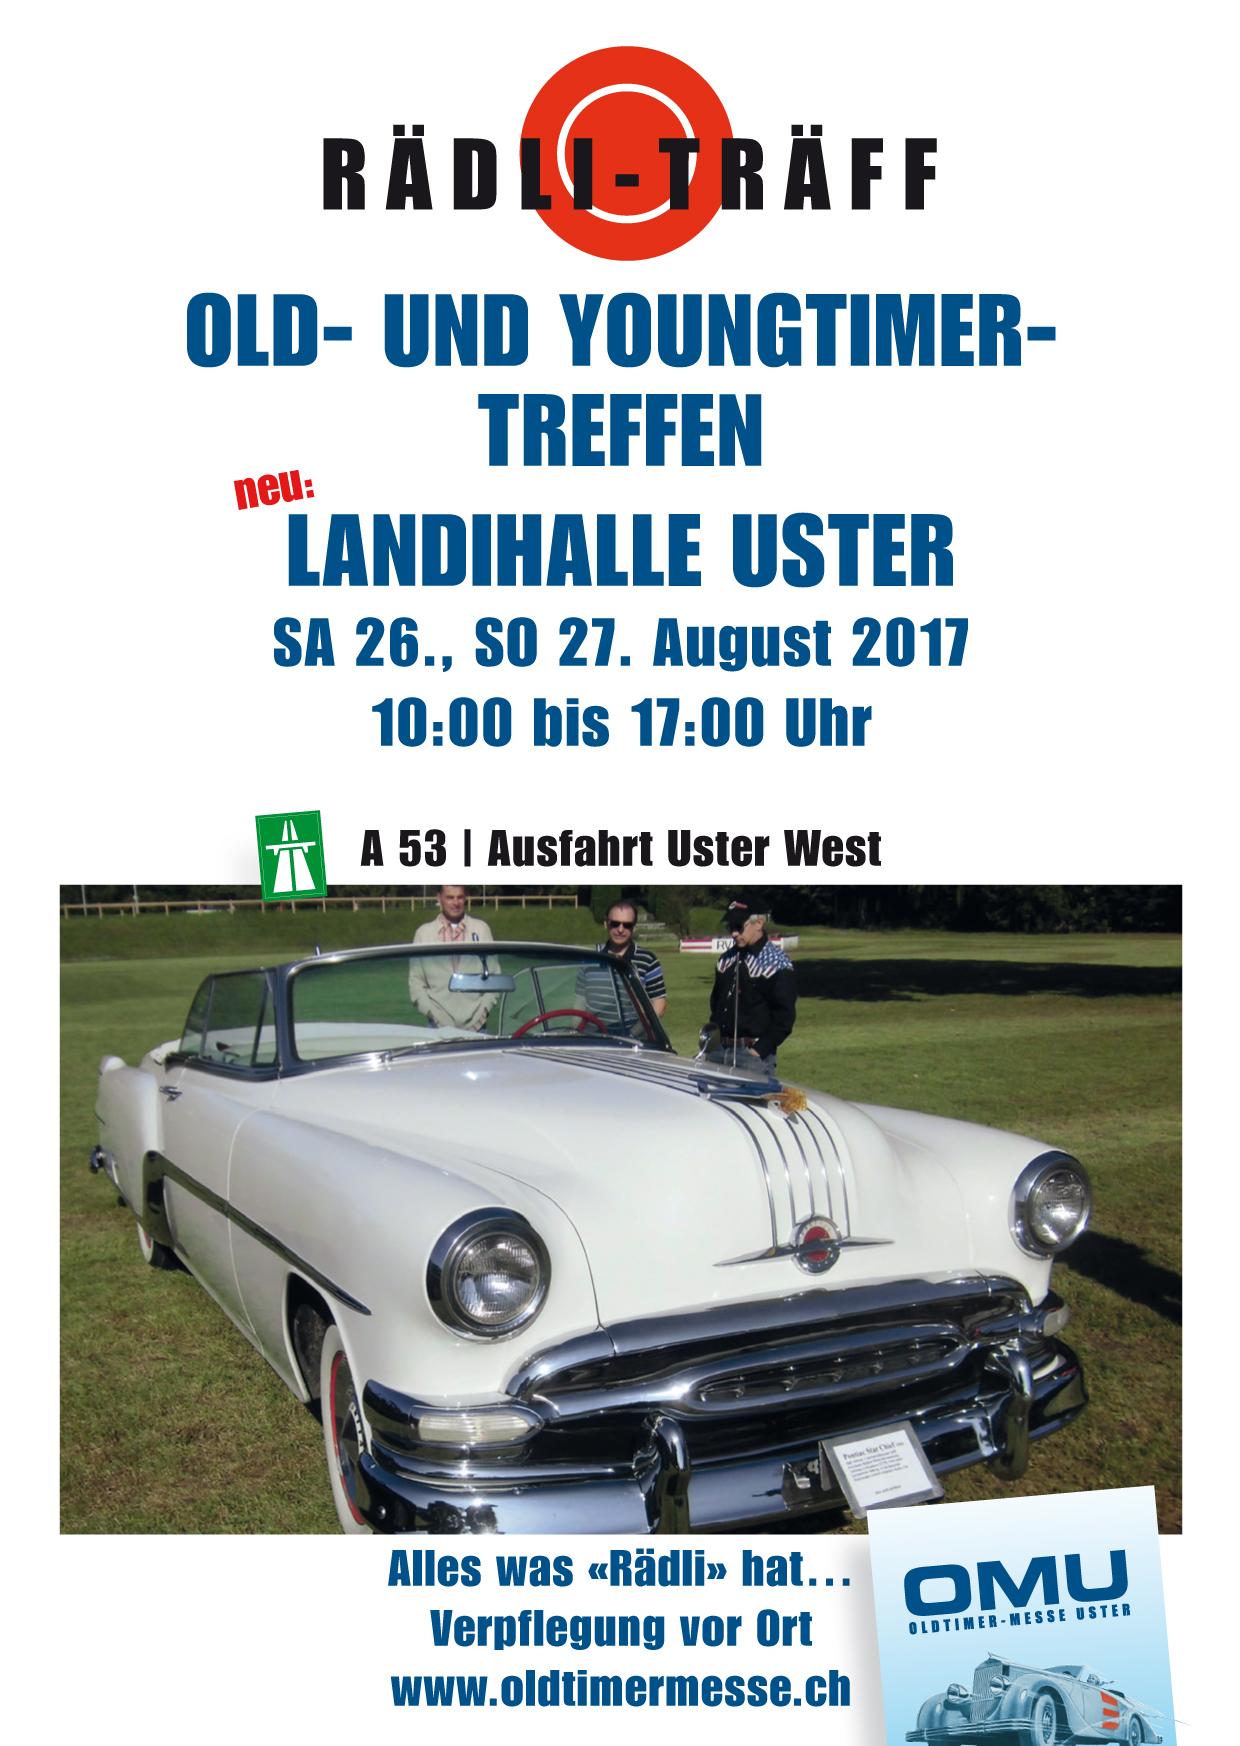 Old- & Youngtimer Treffen Uster @ Stadt- und Landihalle Uster